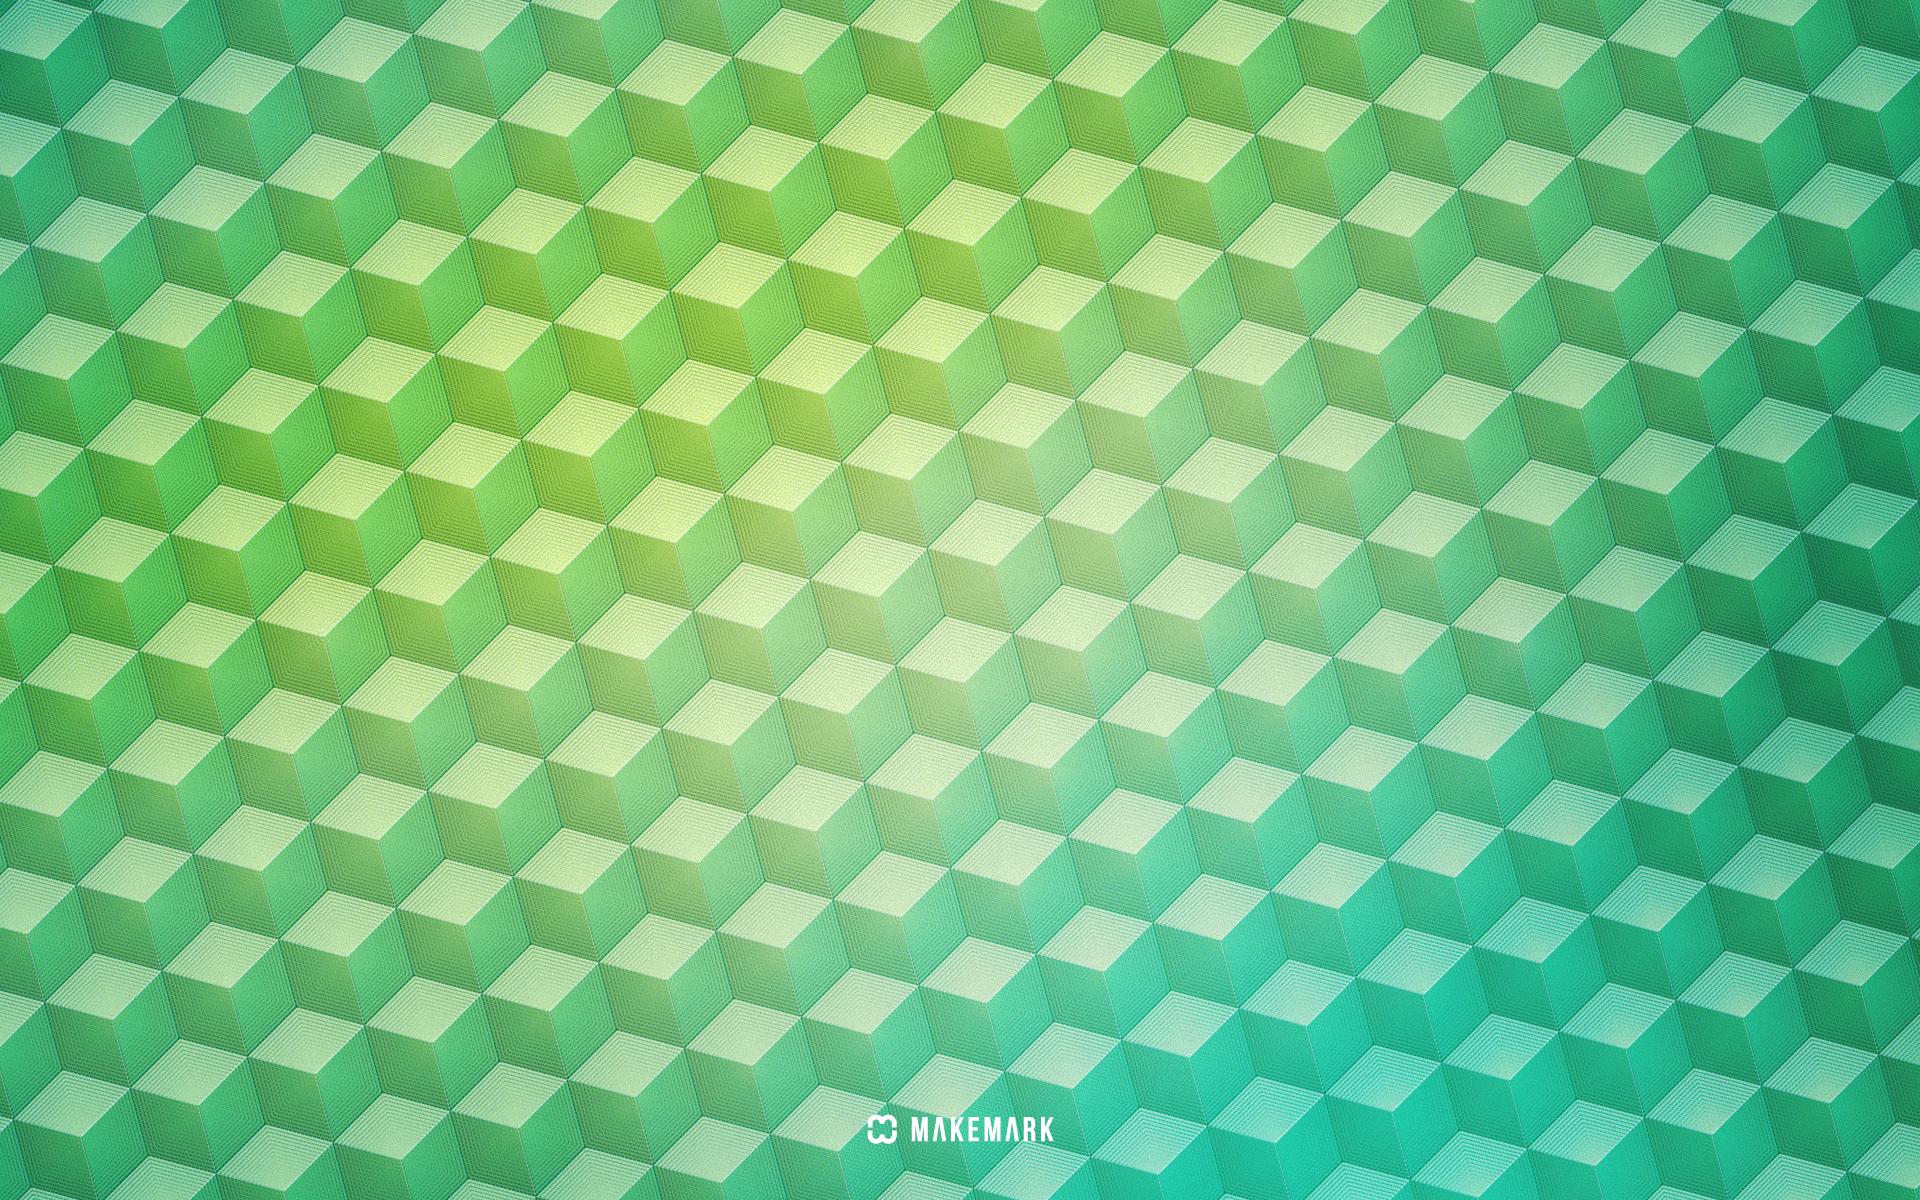 Geometric Wallpaper MakeMark design with purpose 1920x1200